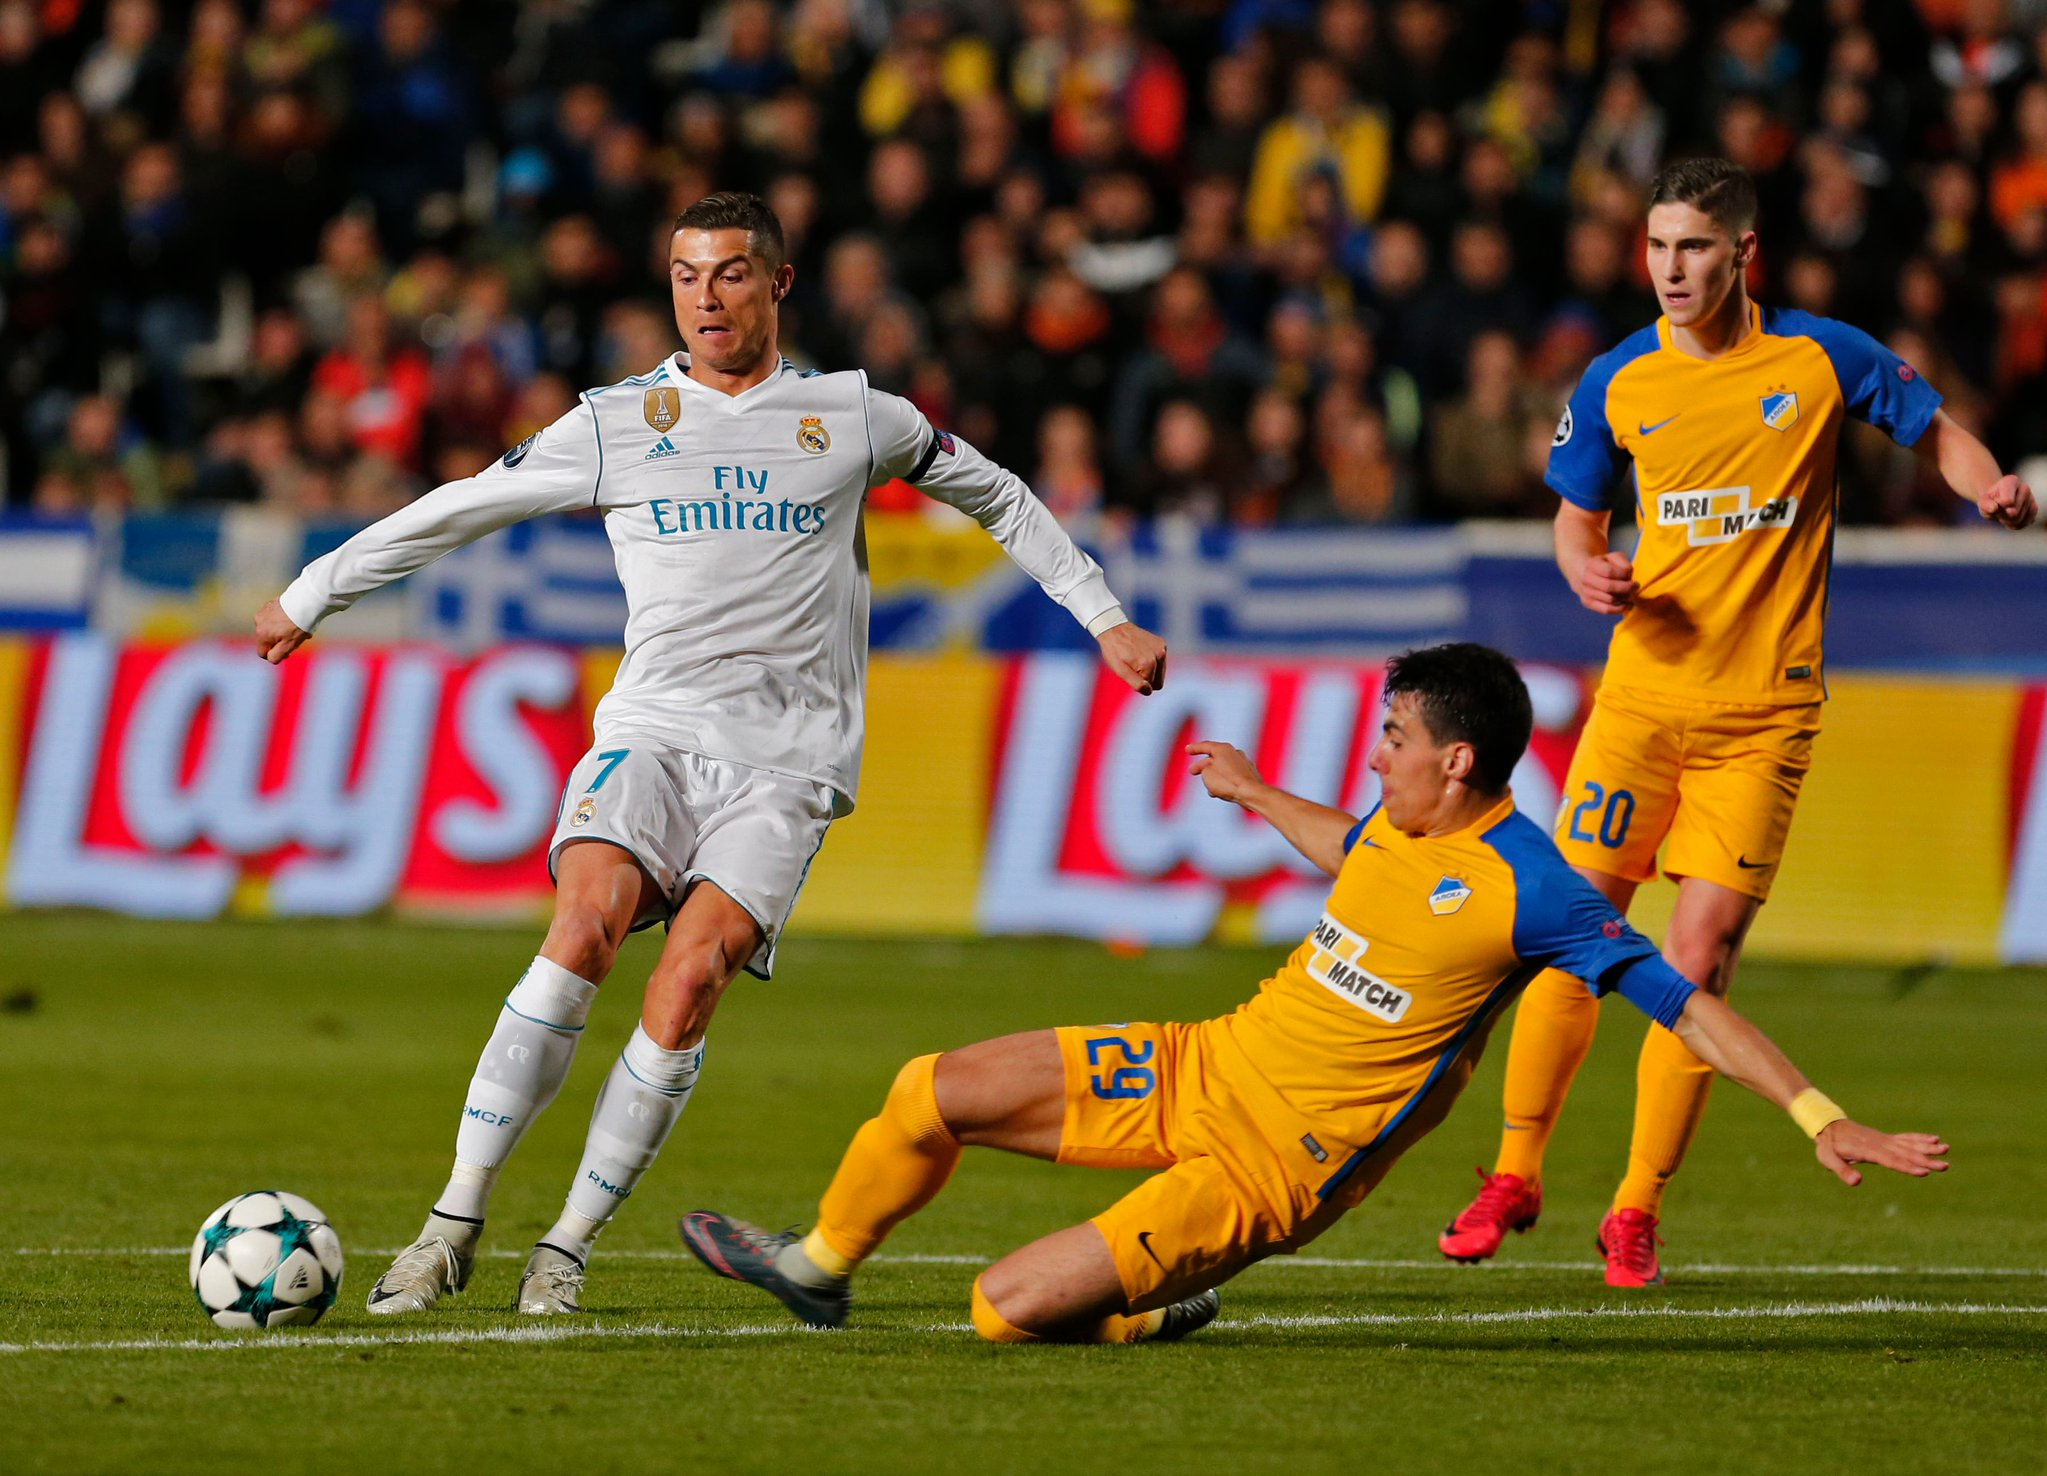 Cristiano Ronaldo goals